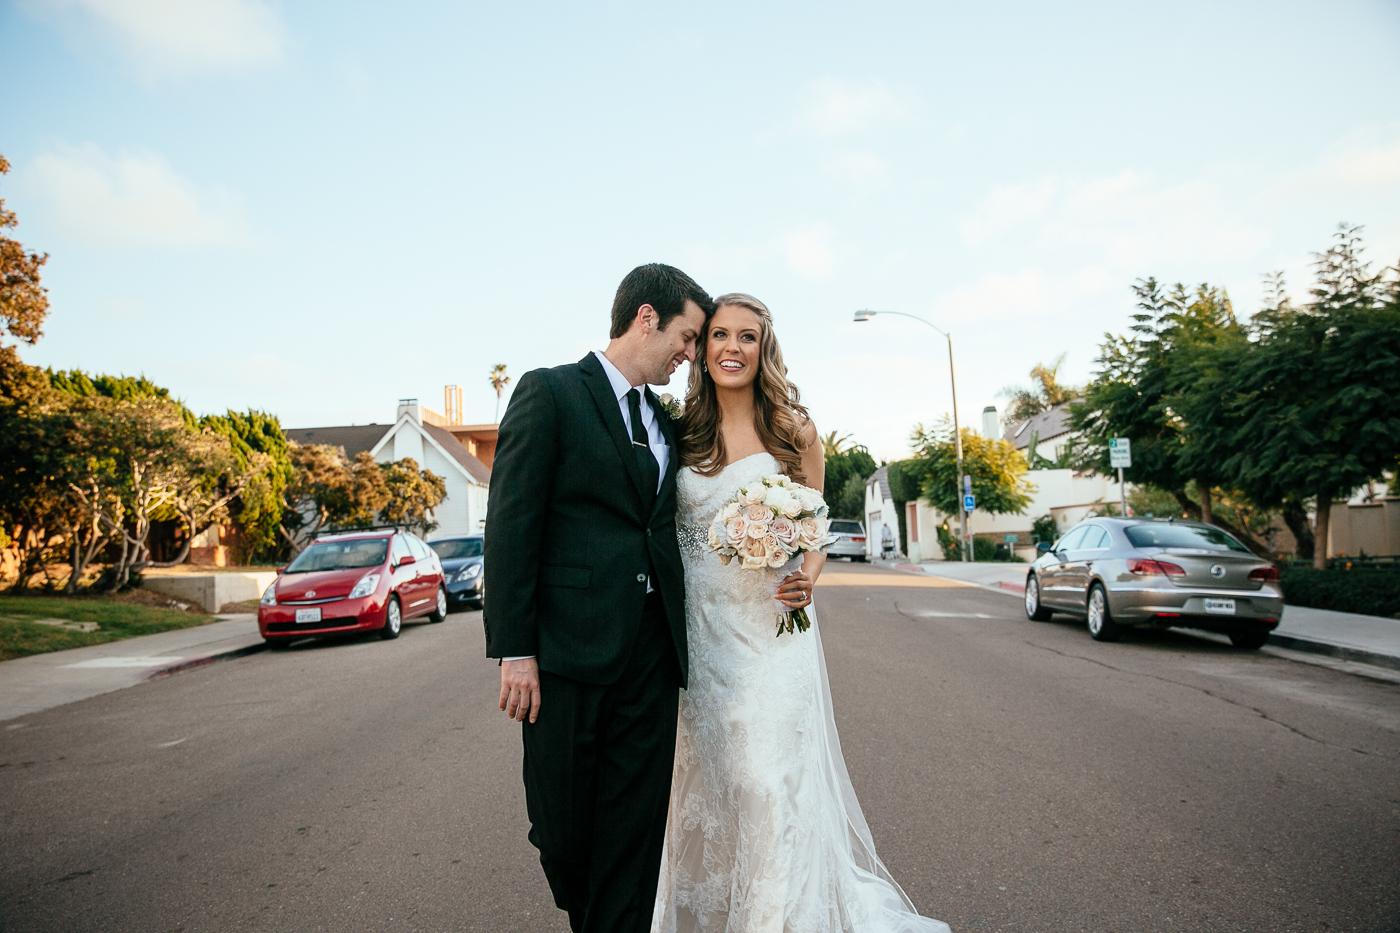 RYAN_&_KELLEY_DARLINGTON_HOUSE_WEDDING_2014_7X9A2389.JPG